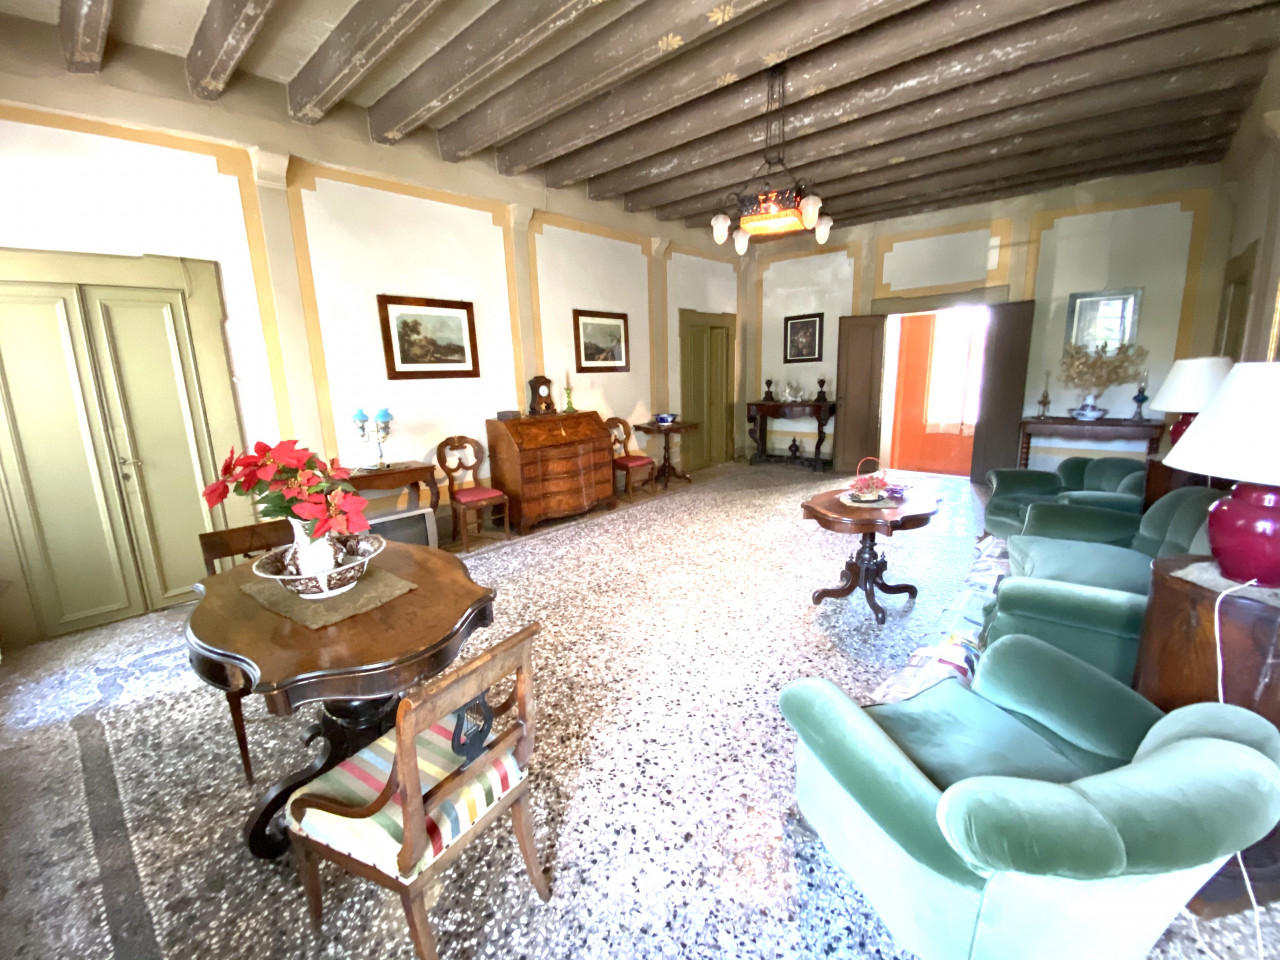 Dimora Storica in vendita in Centro a Valvasone - Rif.P1 https://images.gestionaleimmobiliare.it/foto/annunci/200820/2282895/1280x1280/006__img_3573.jpg